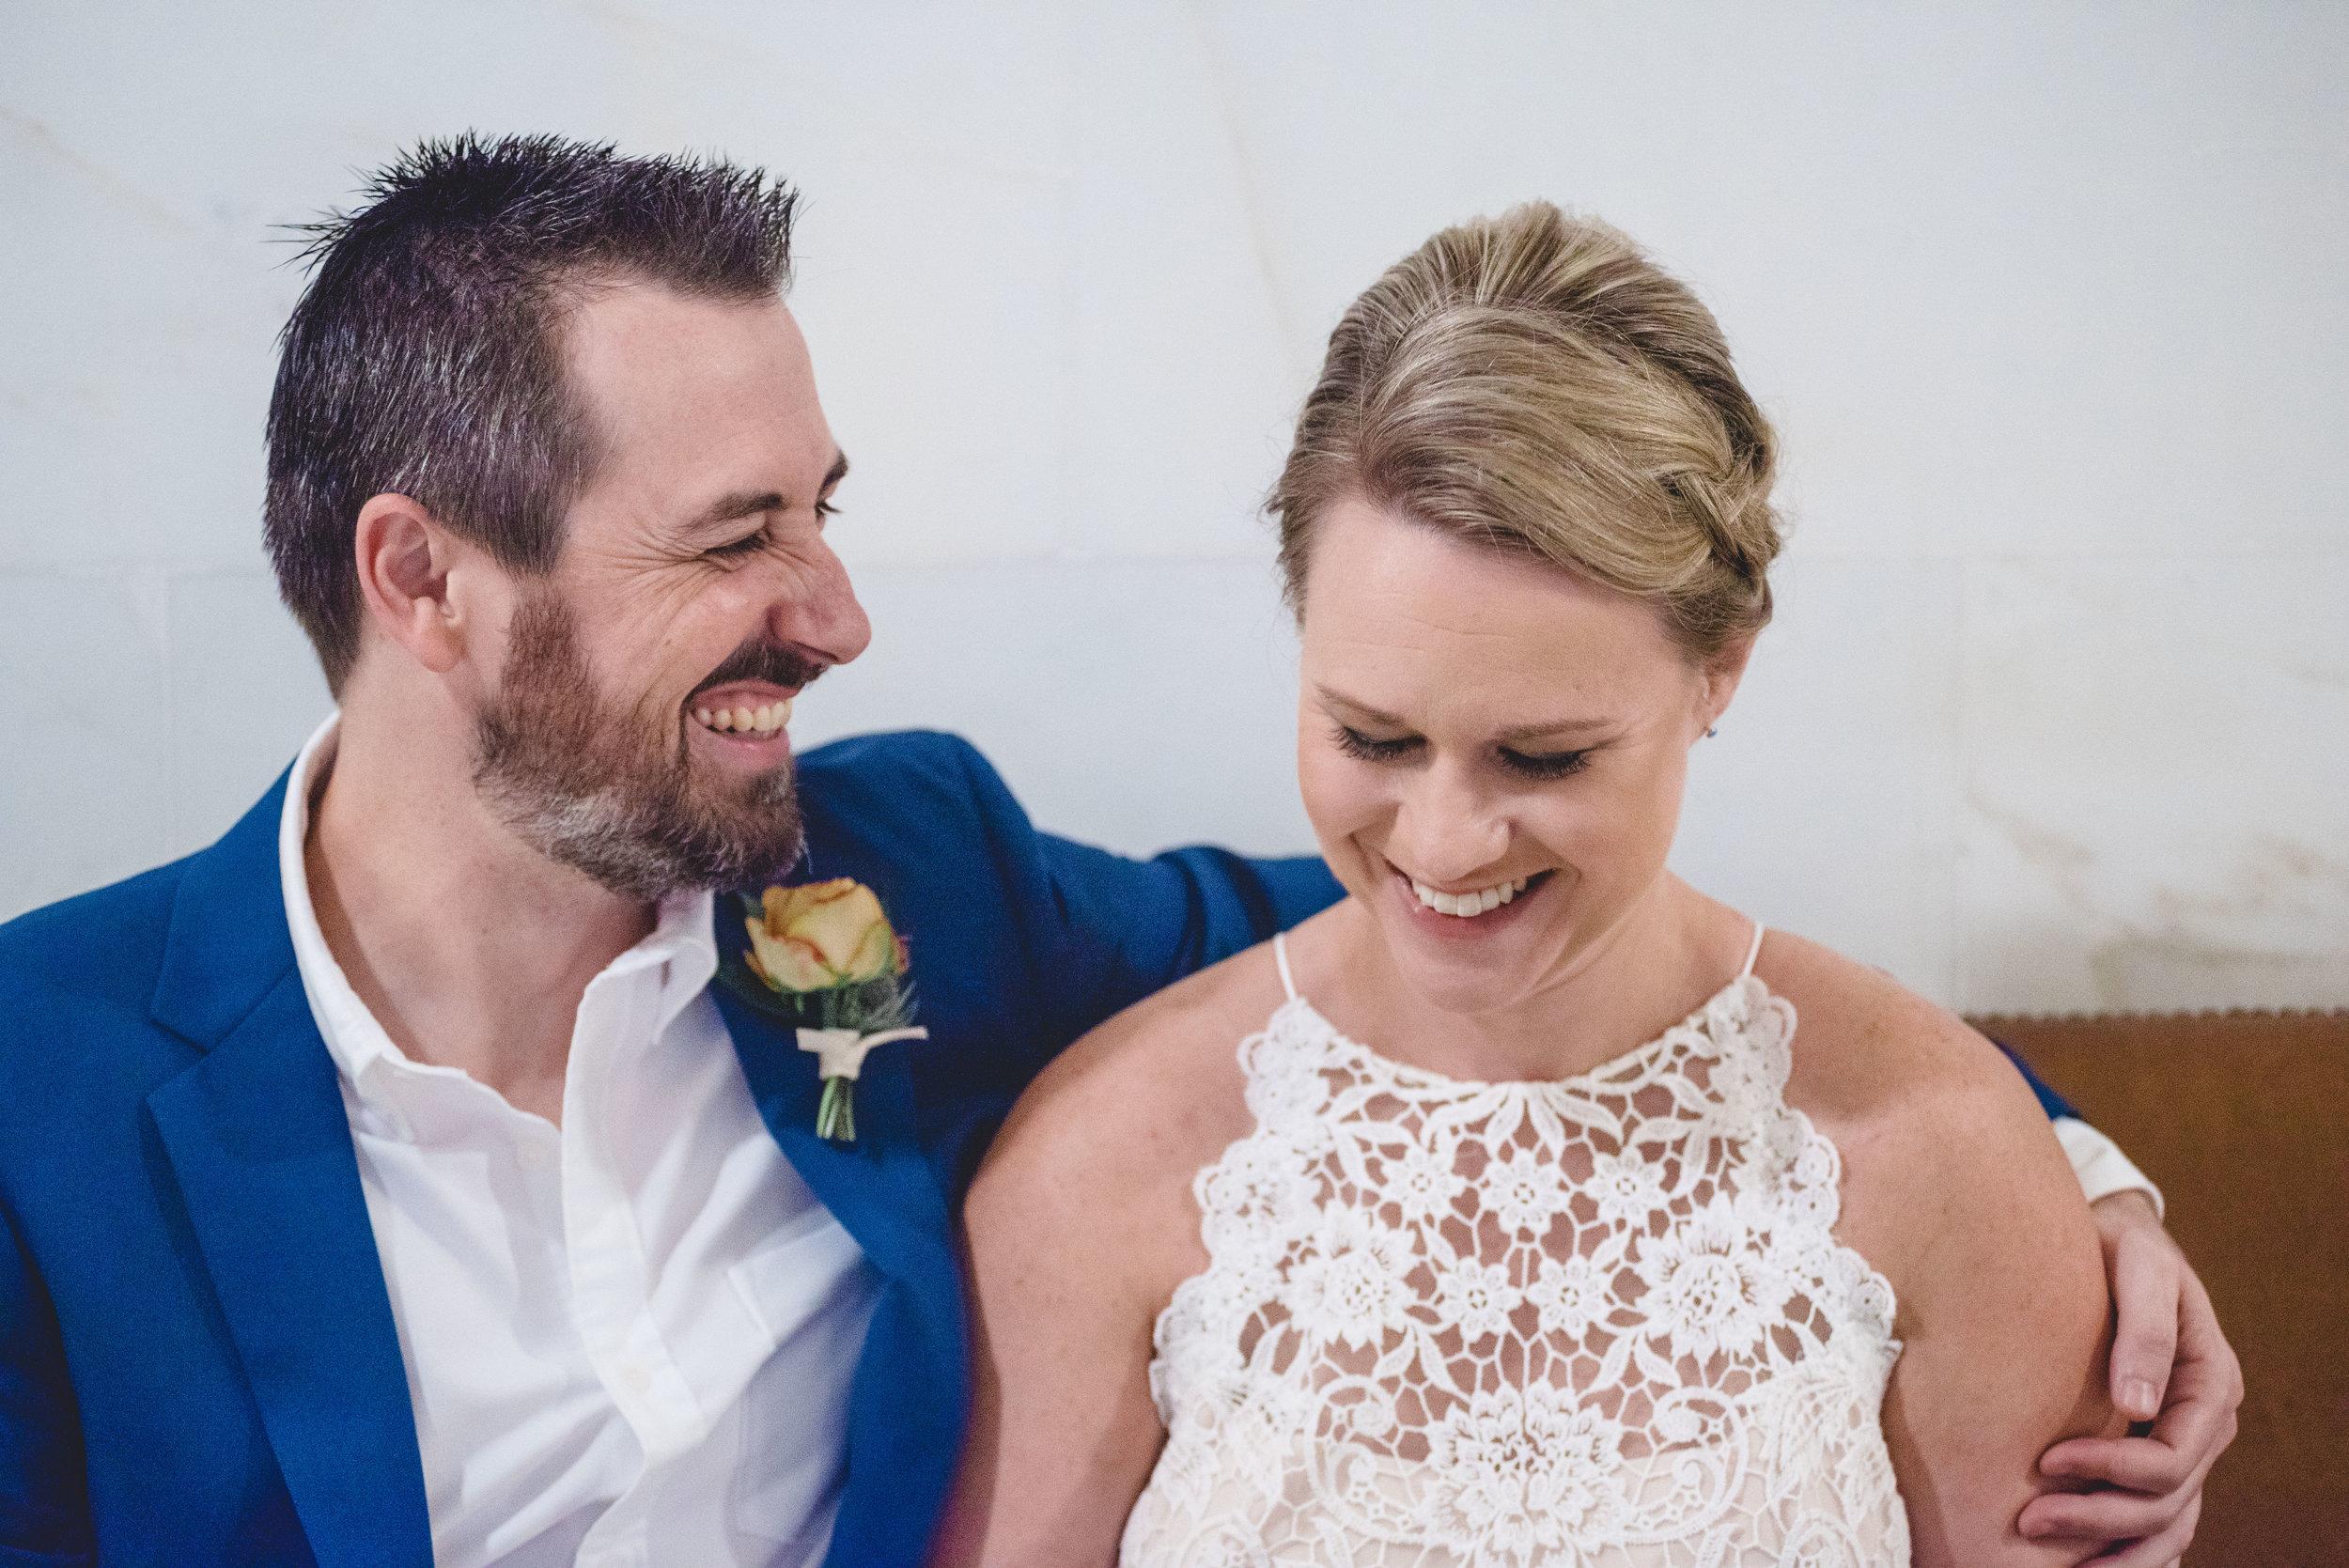 mcdaniels_conroy-wedding-couple-38.jpg